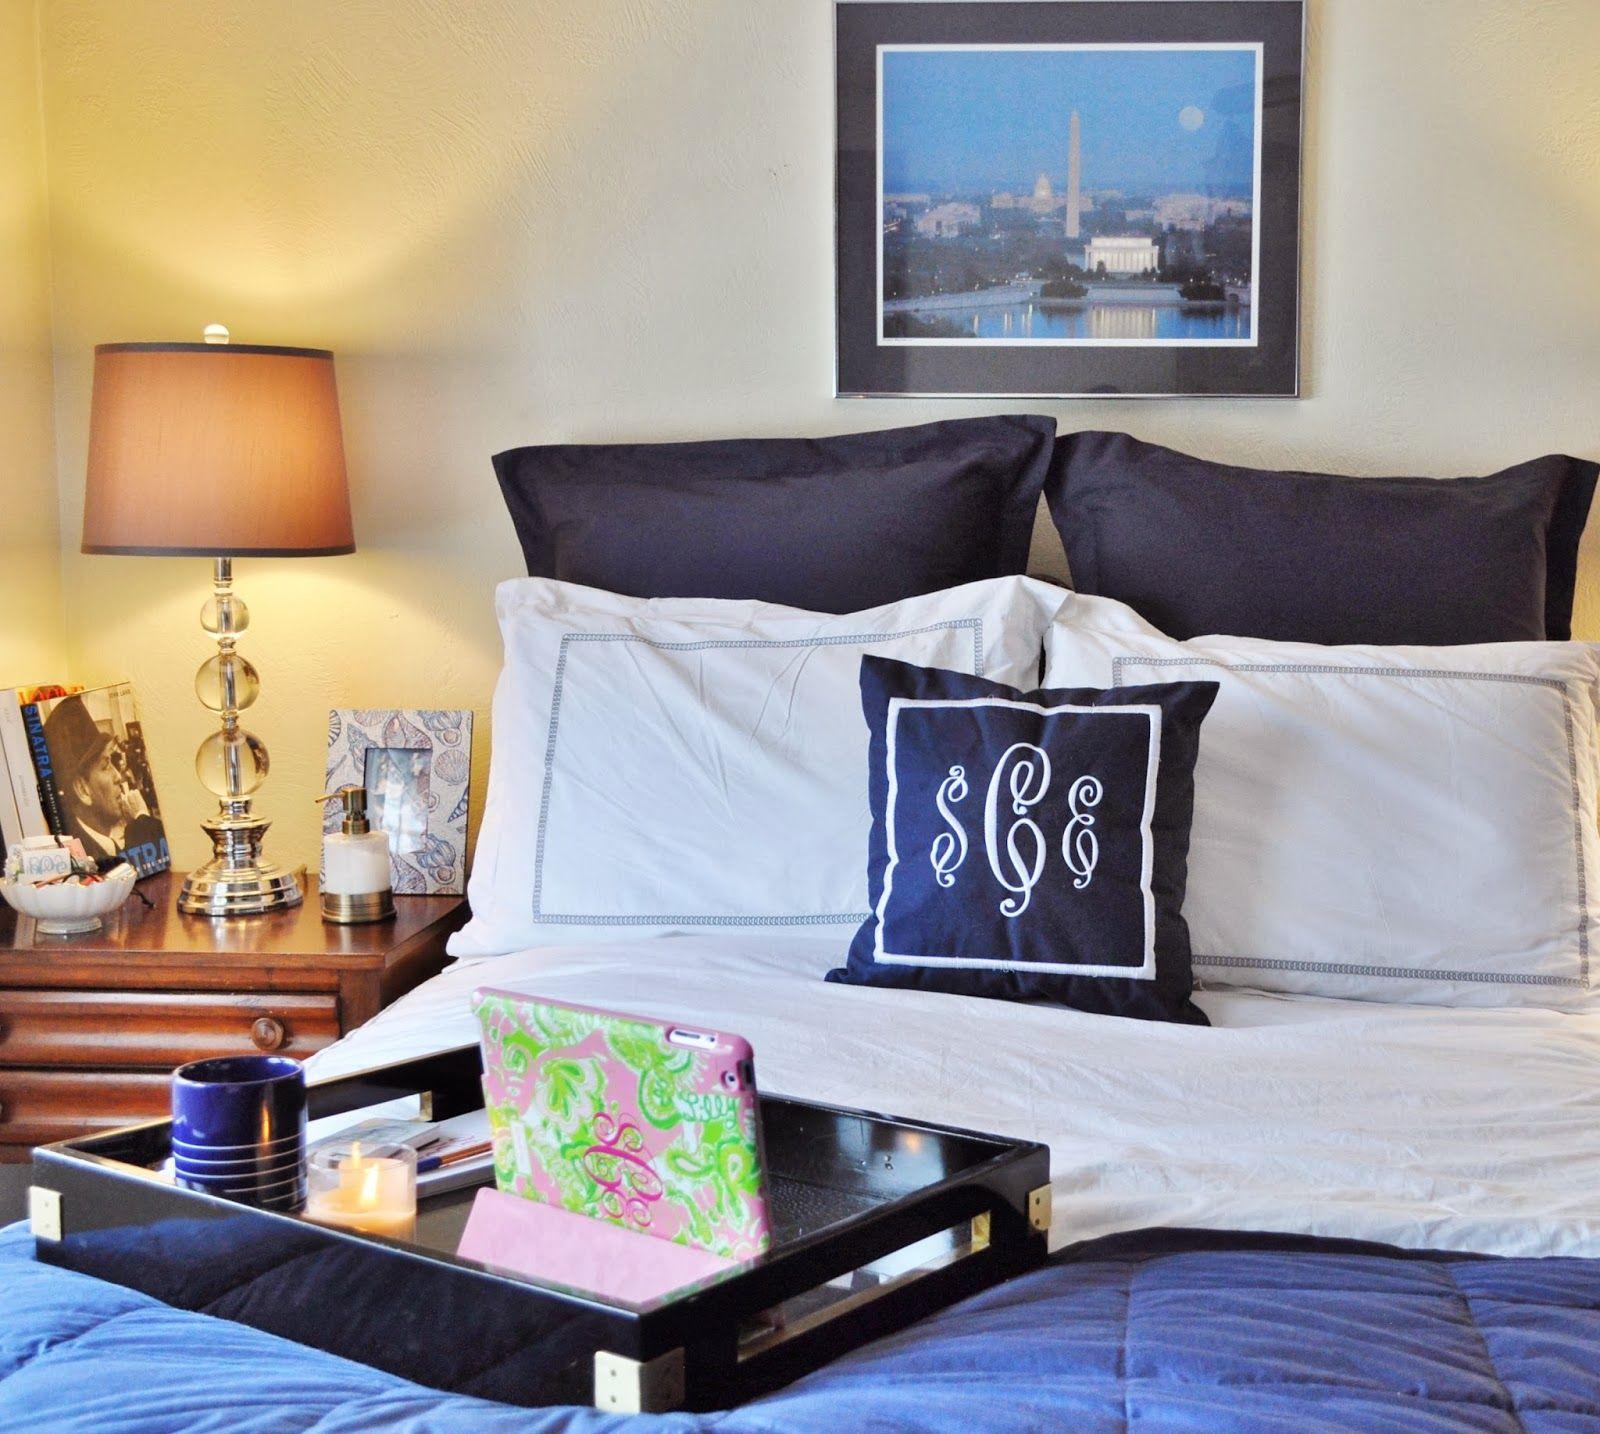 navy blue and white bedding, monogram pillow